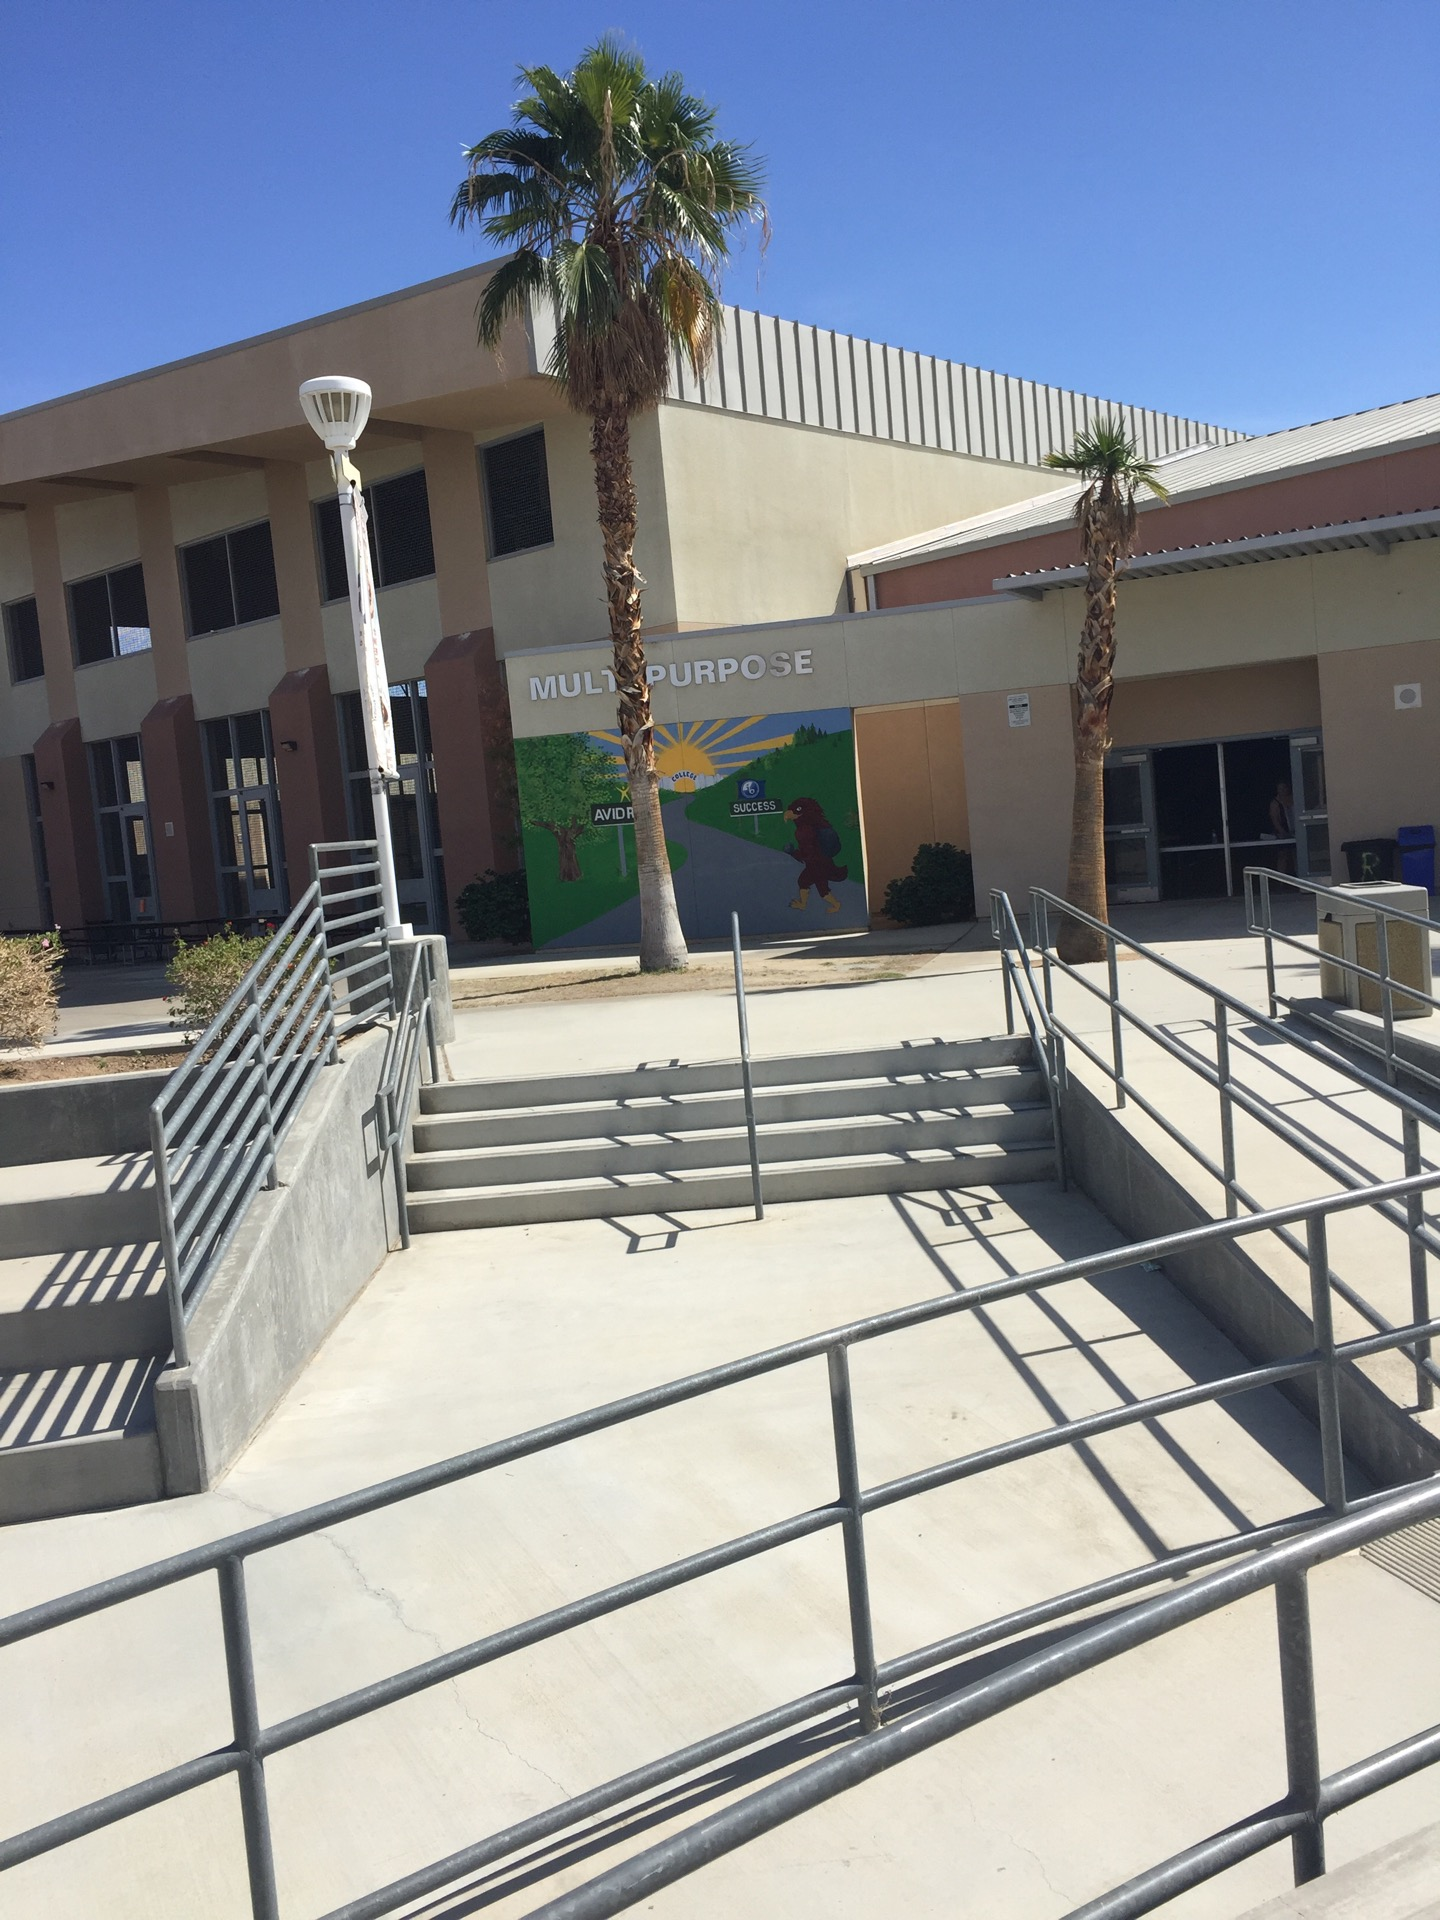 John Glenn Middle School Of International Studies   79-655 Miles Ave, Indio, CA, 92201   +1 (760) 200-3700